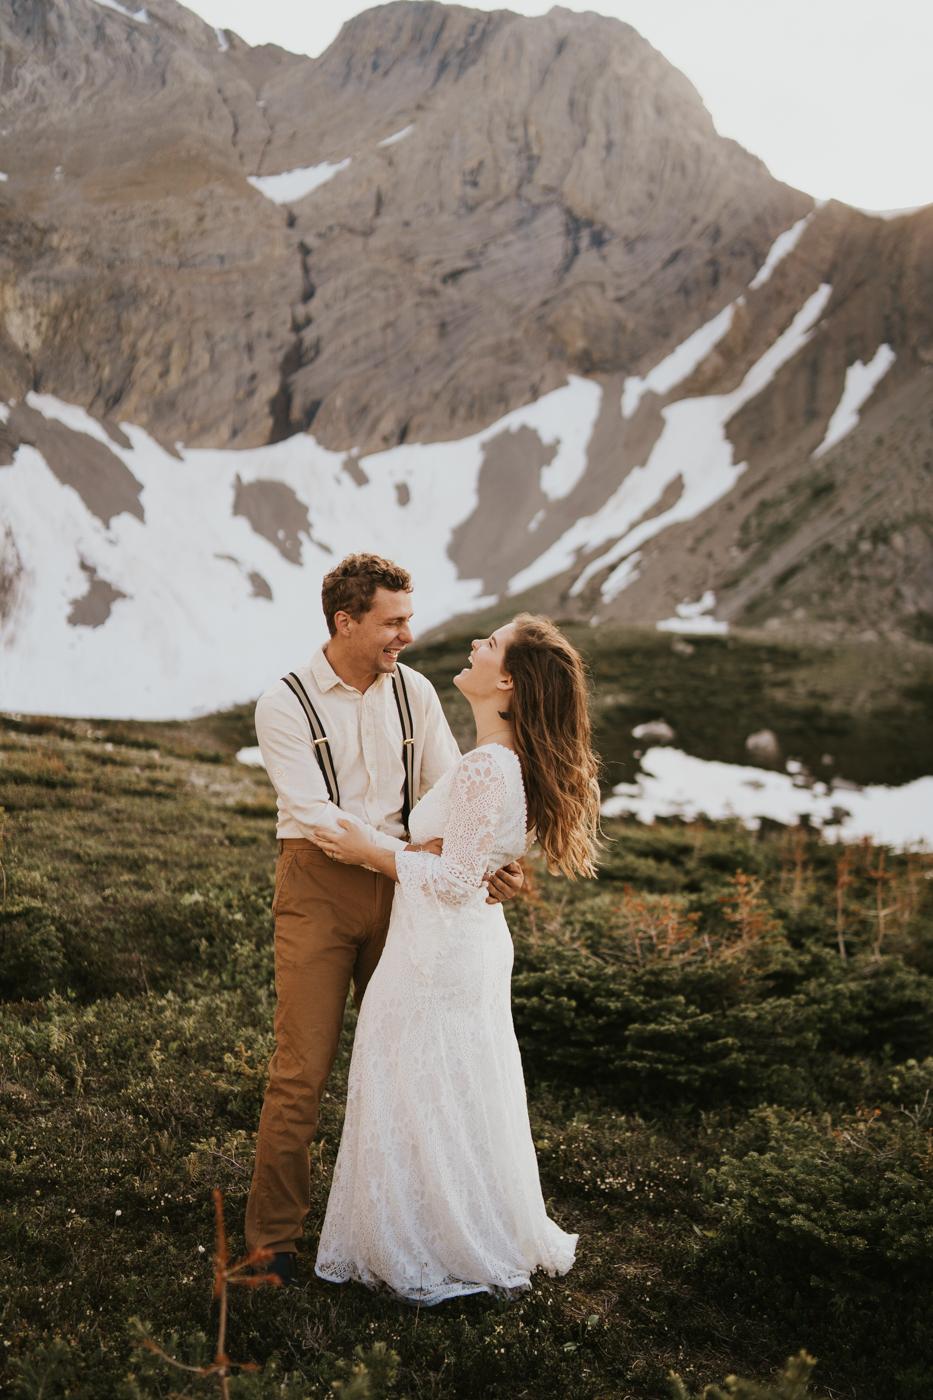 tyraephotography_photographer_wedding_elopement_engagement_photography-08013.jpg